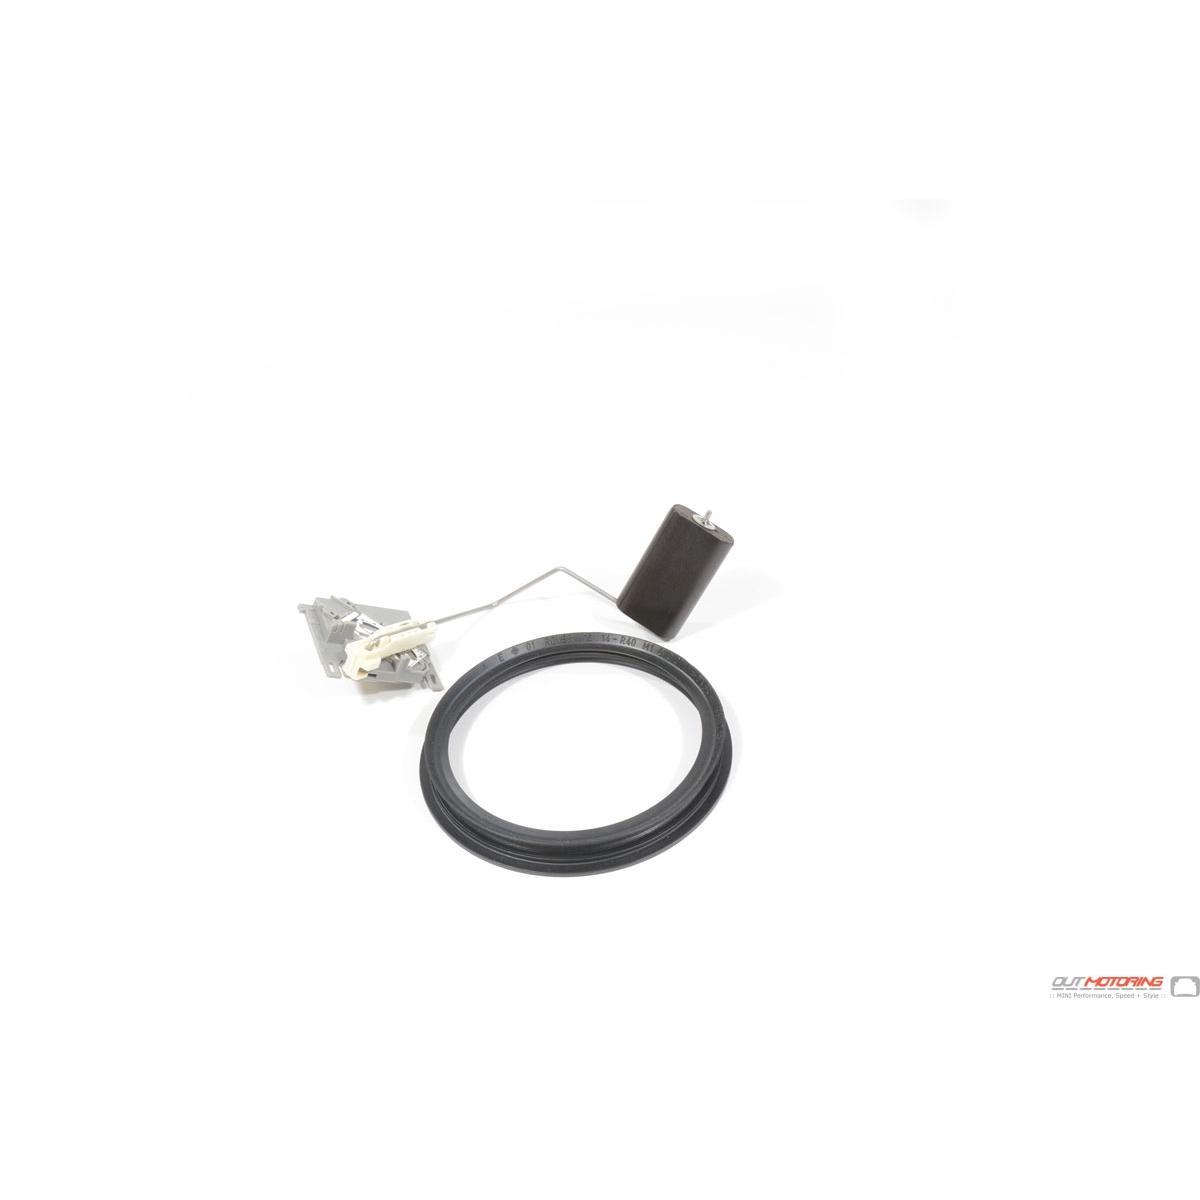 16146766178 16146765127 mini cooper fuel gas level sensor r50 2 3 mini cooper accessories. Black Bedroom Furniture Sets. Home Design Ideas